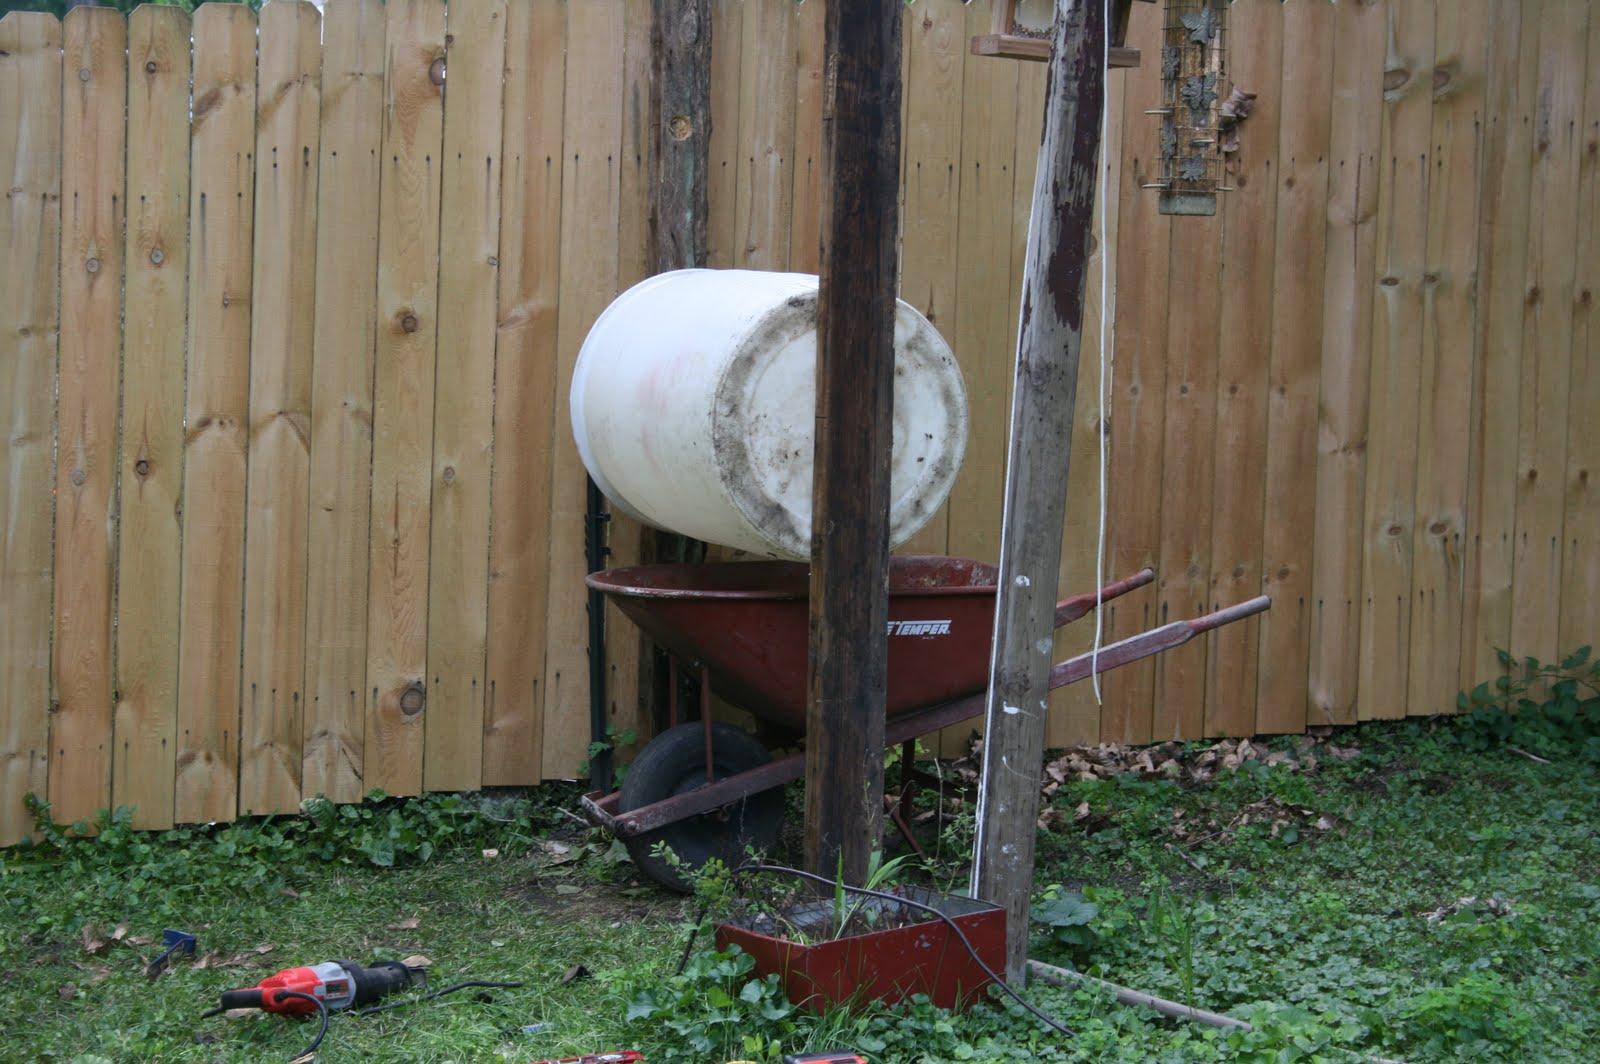 One barrel suspended between poles with a wheelbarrow underneath